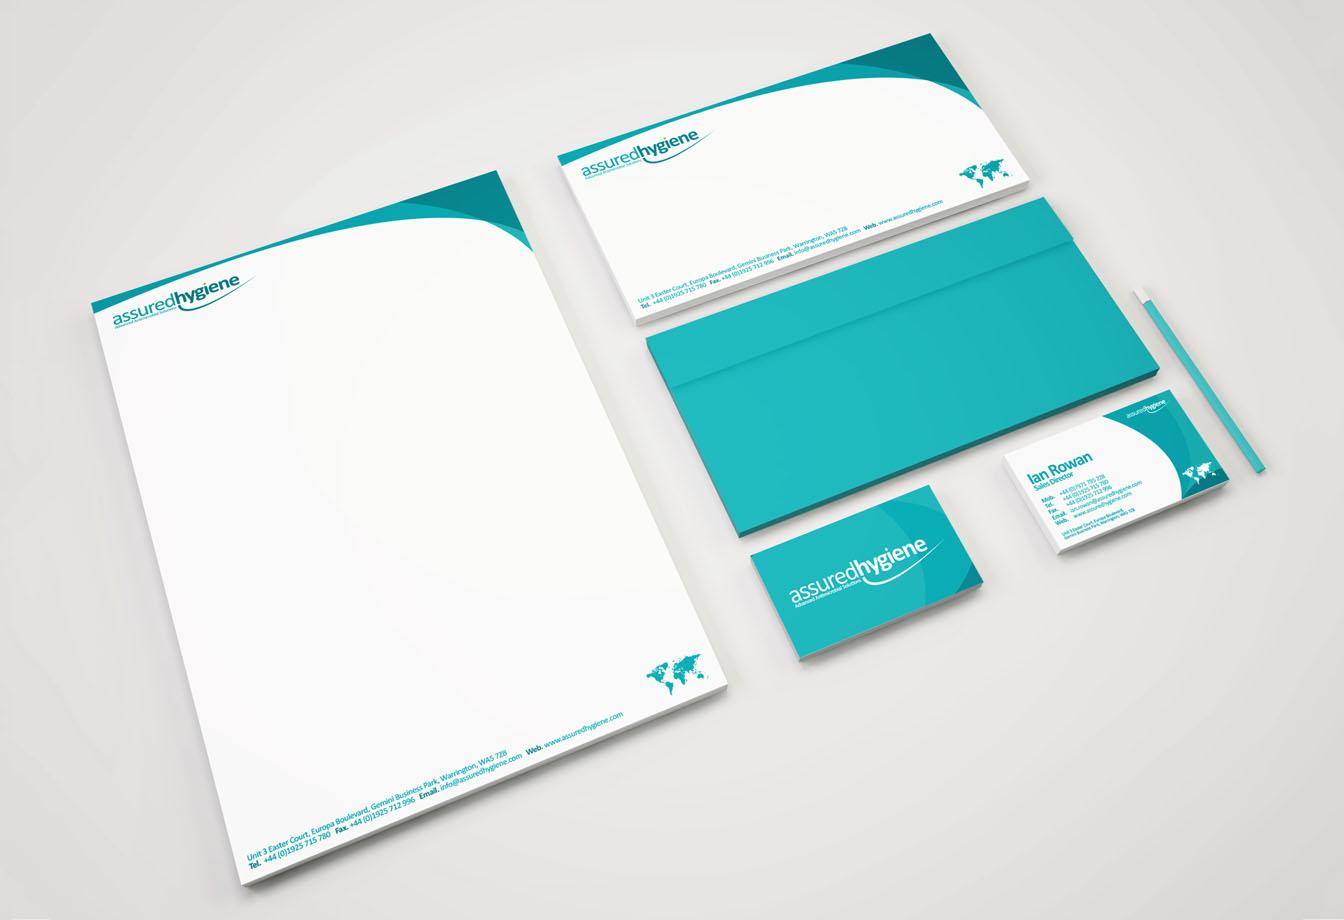 Graphic Design Warrington - Digital, Branding, Websites Design ...